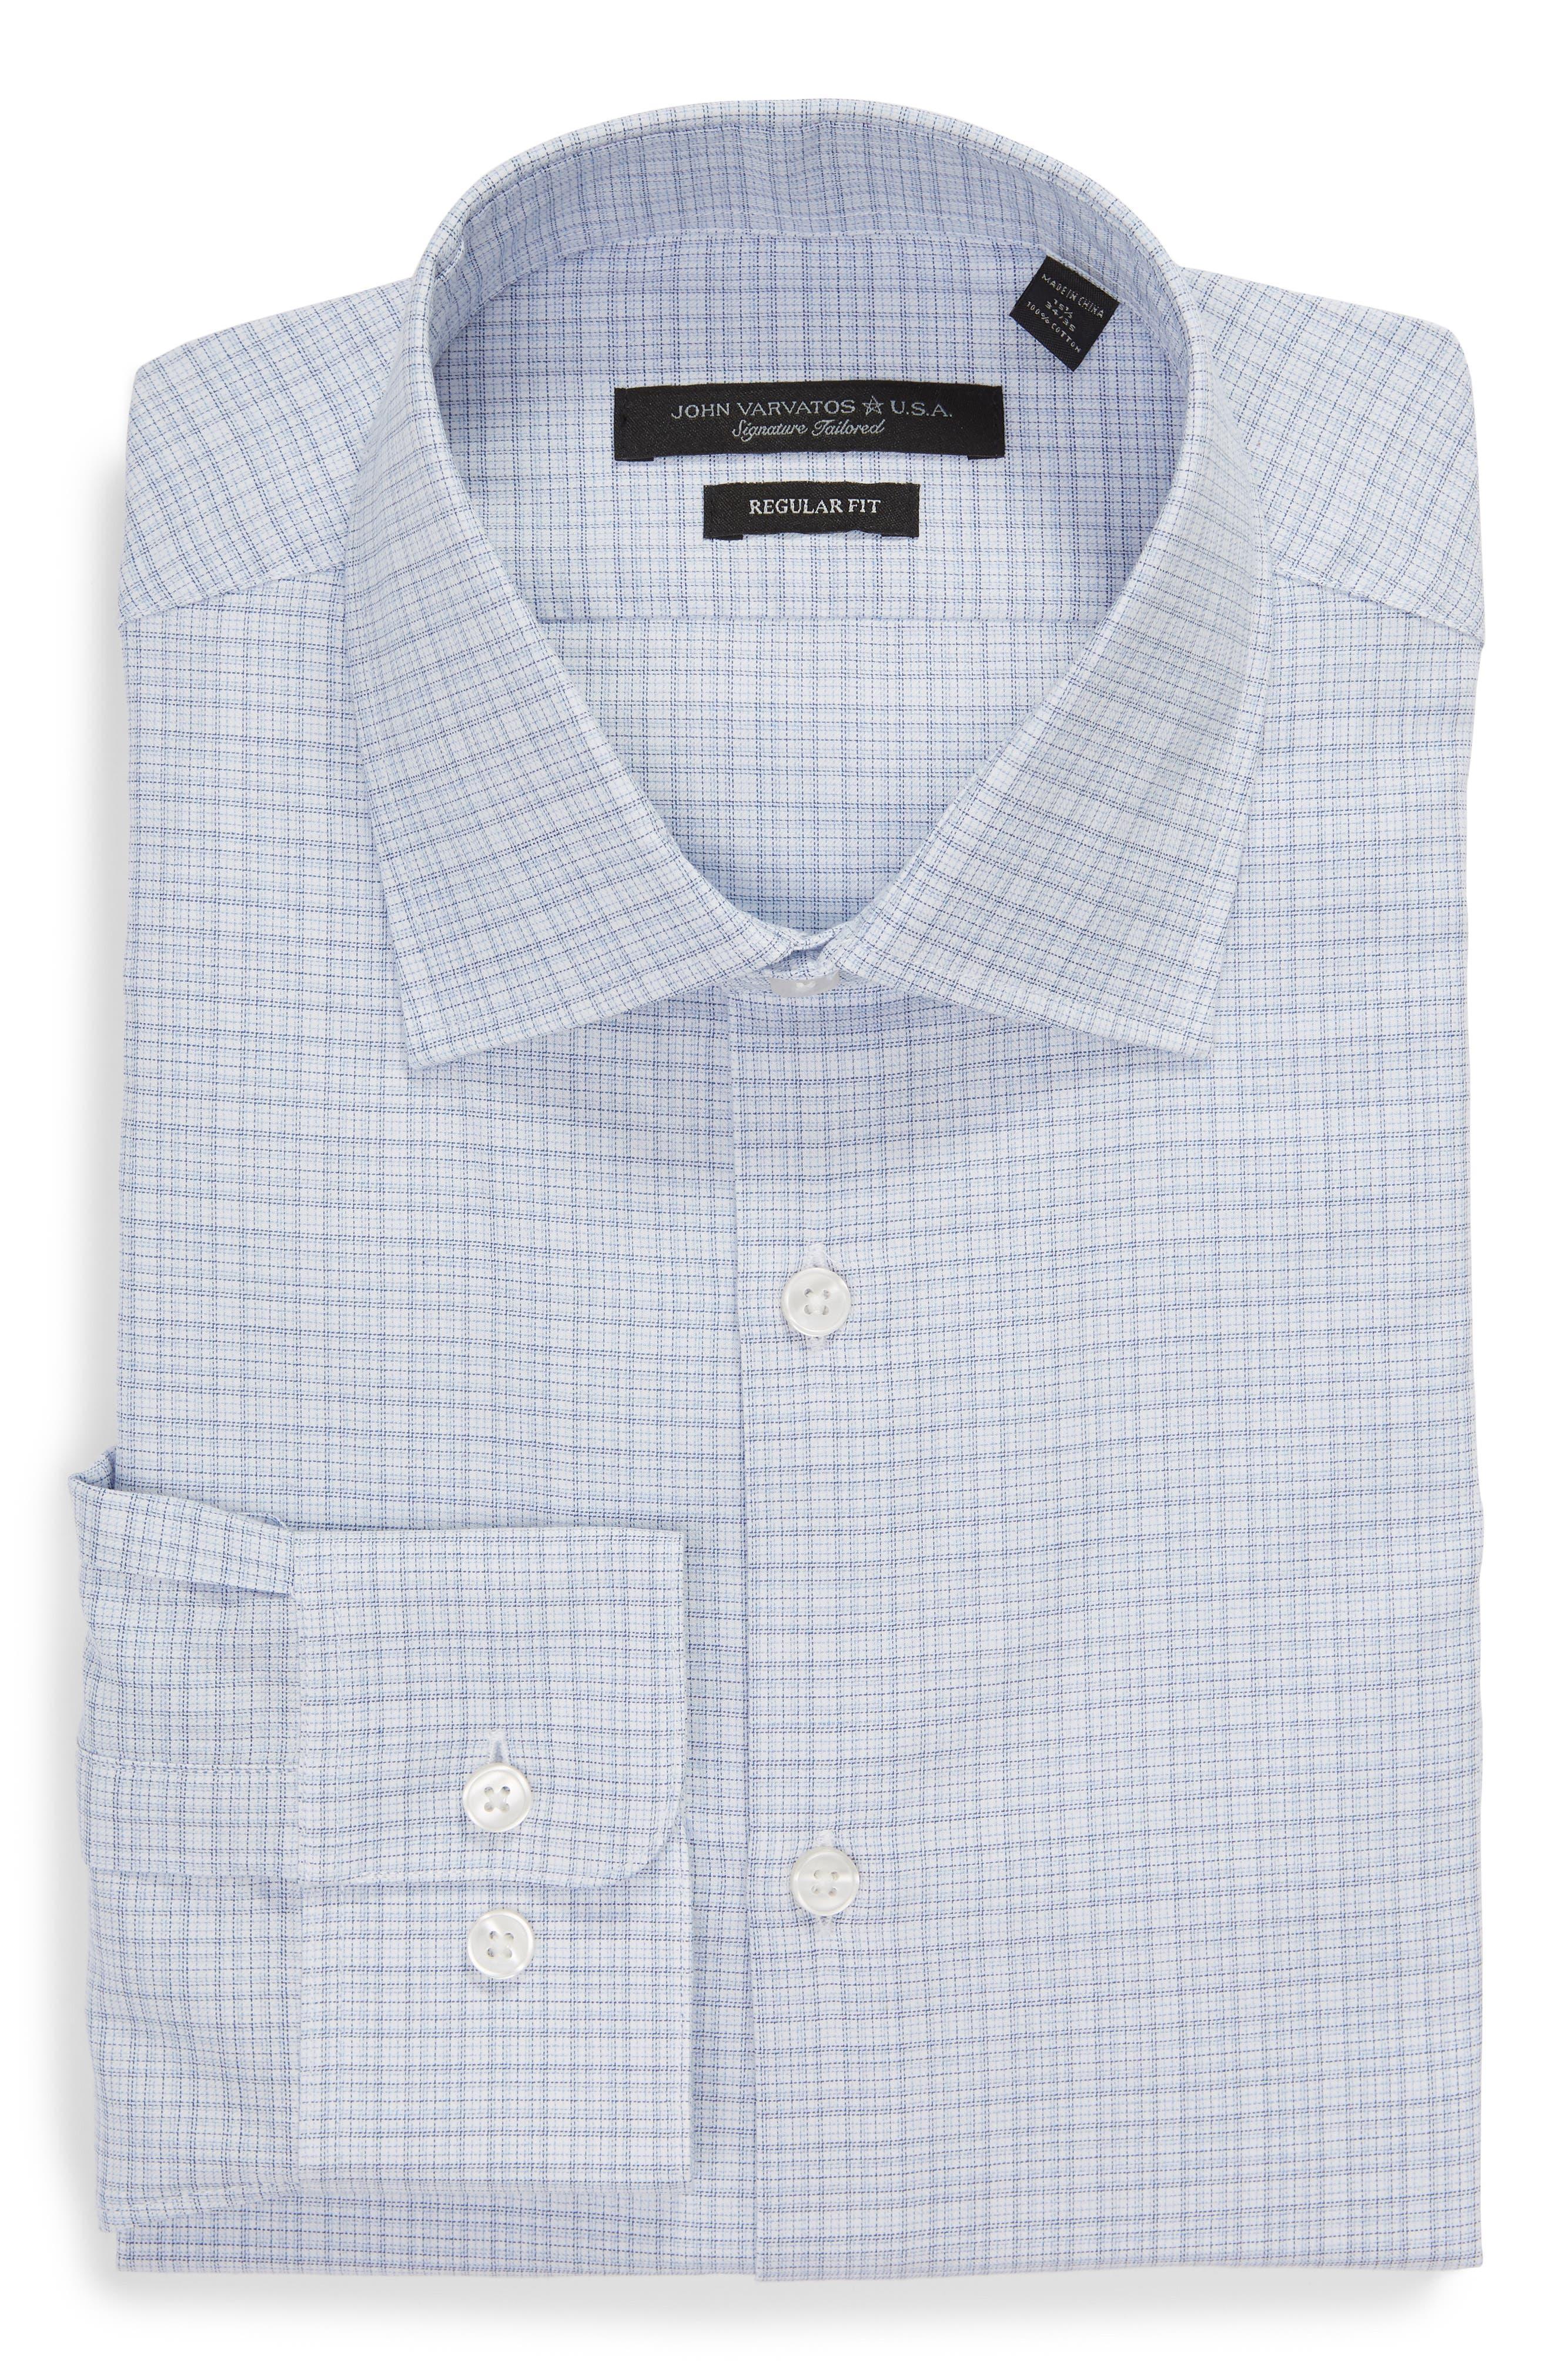 Regular Fit Plaid Dress Shirt,                             Alternate thumbnail 5, color,                             SKY BLUE